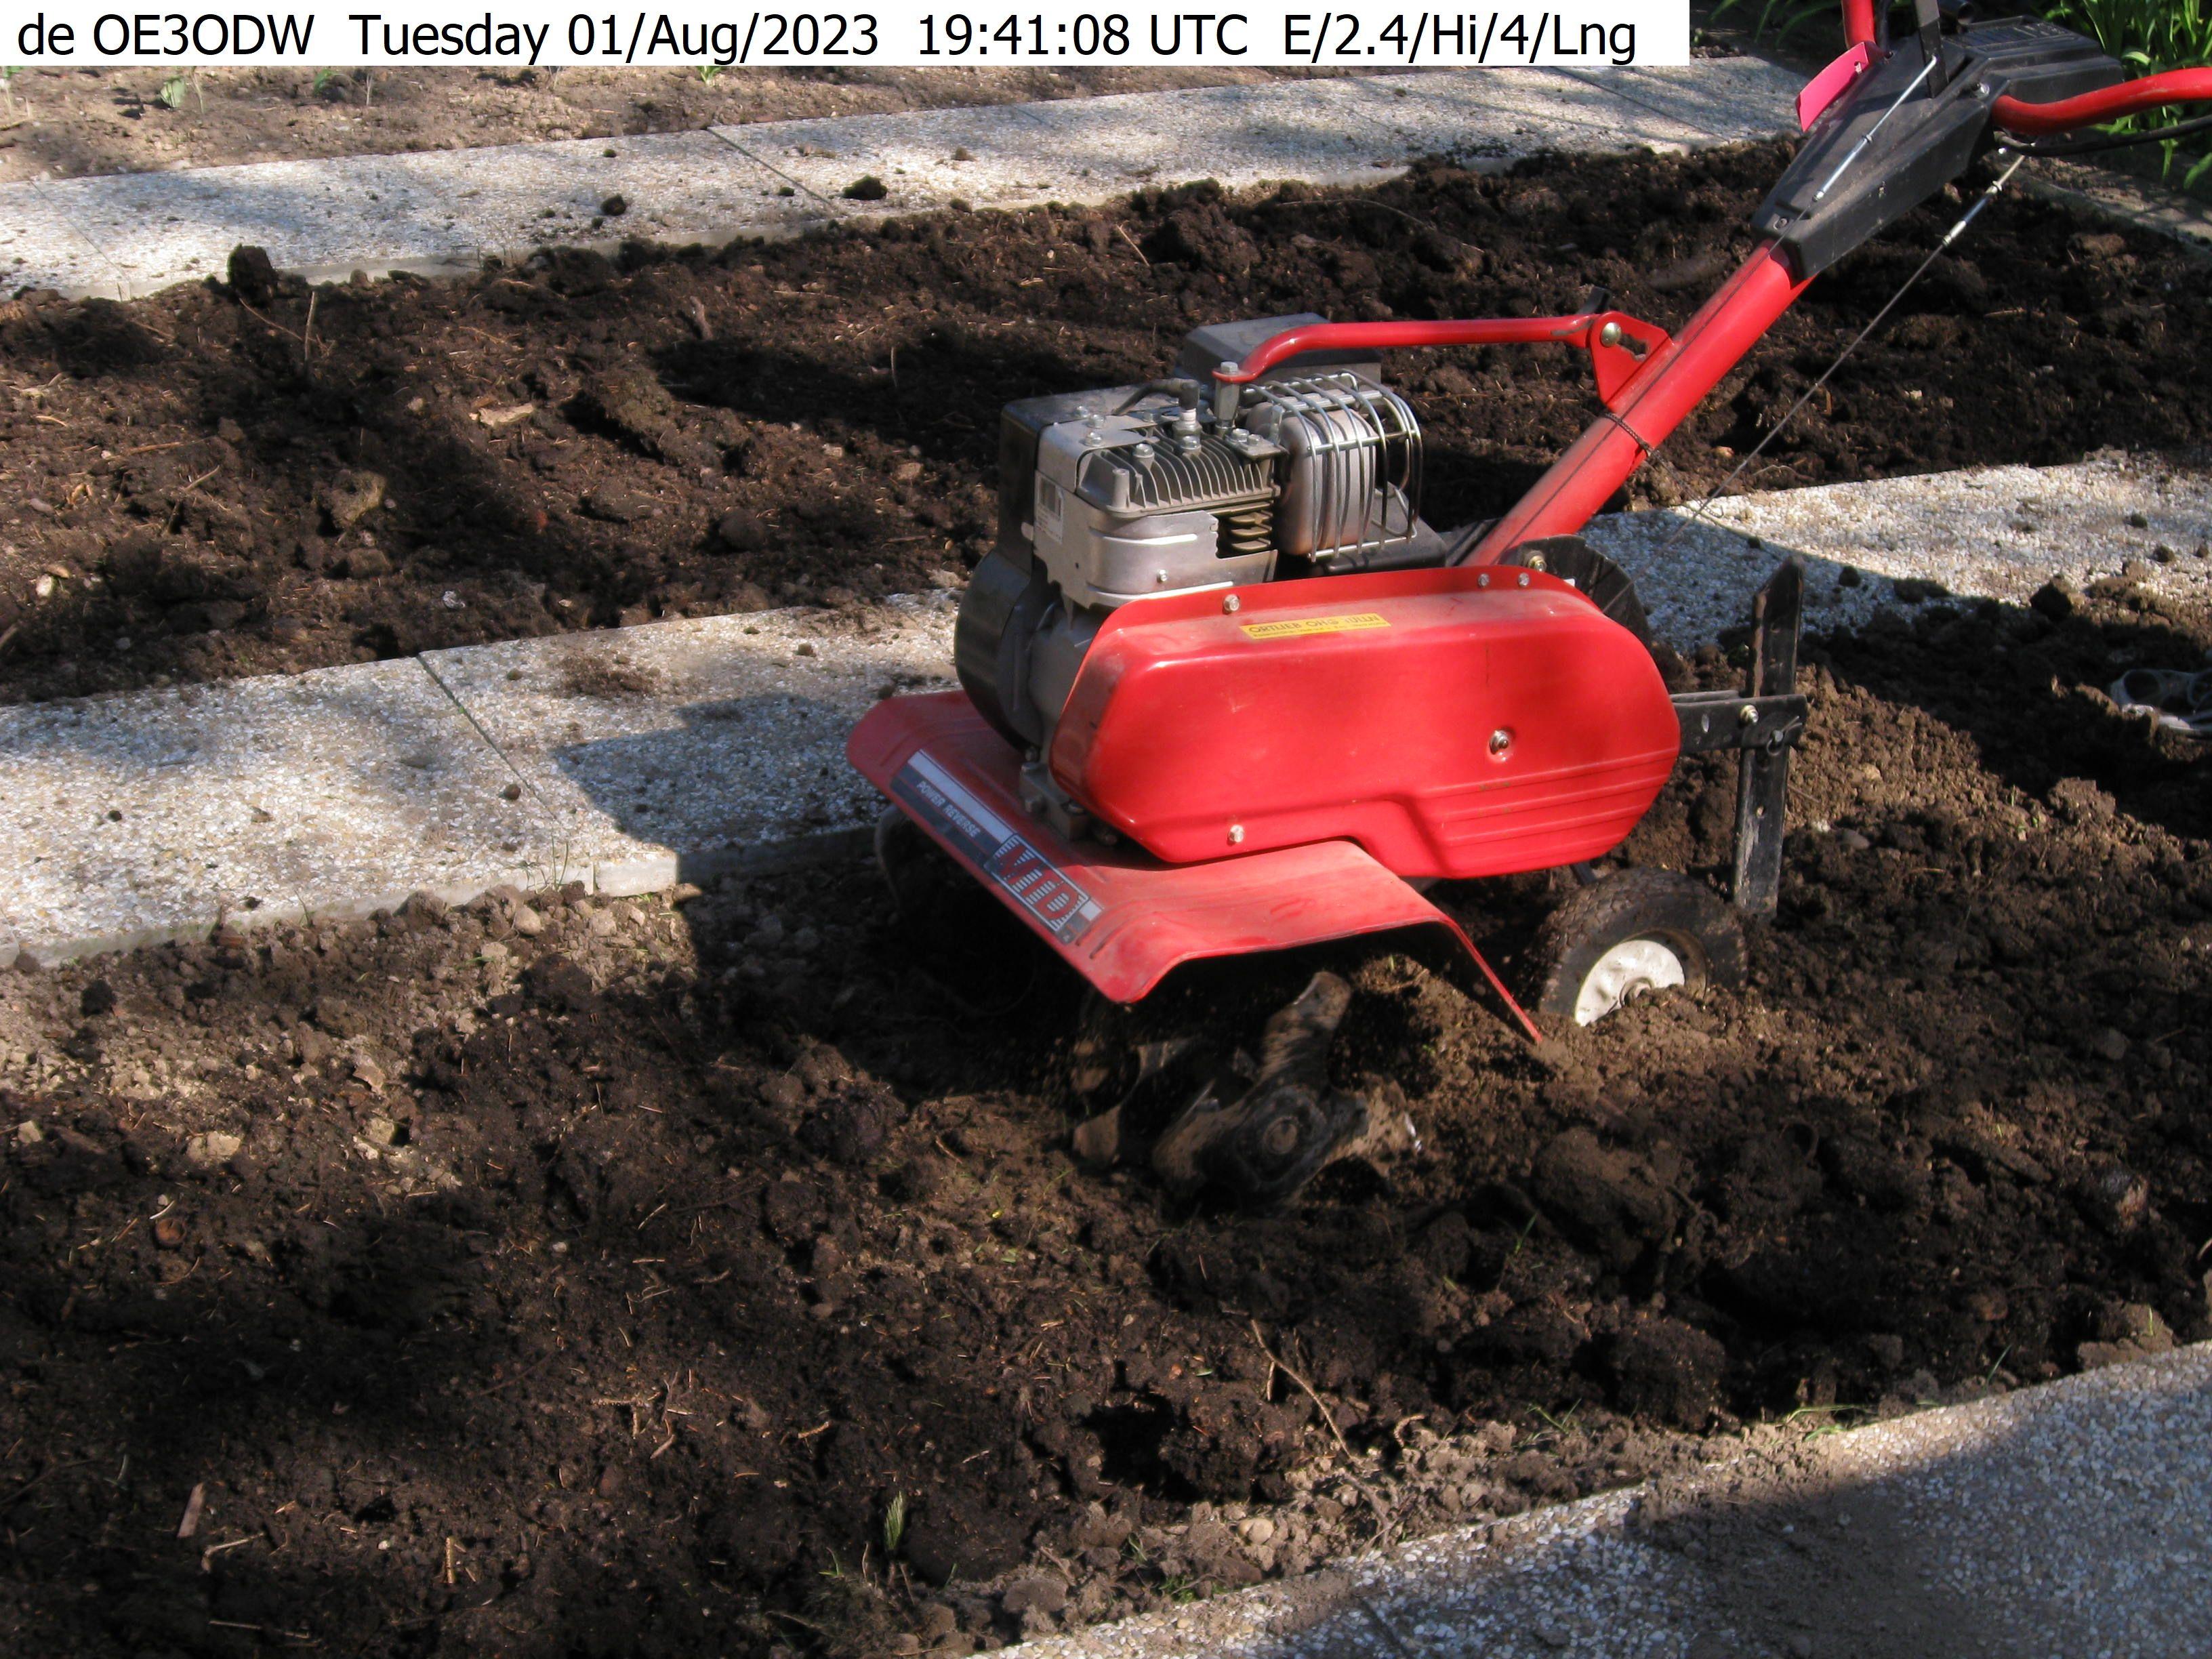 24-Oct-2021 06:52:02 UTC de PA0041SWL